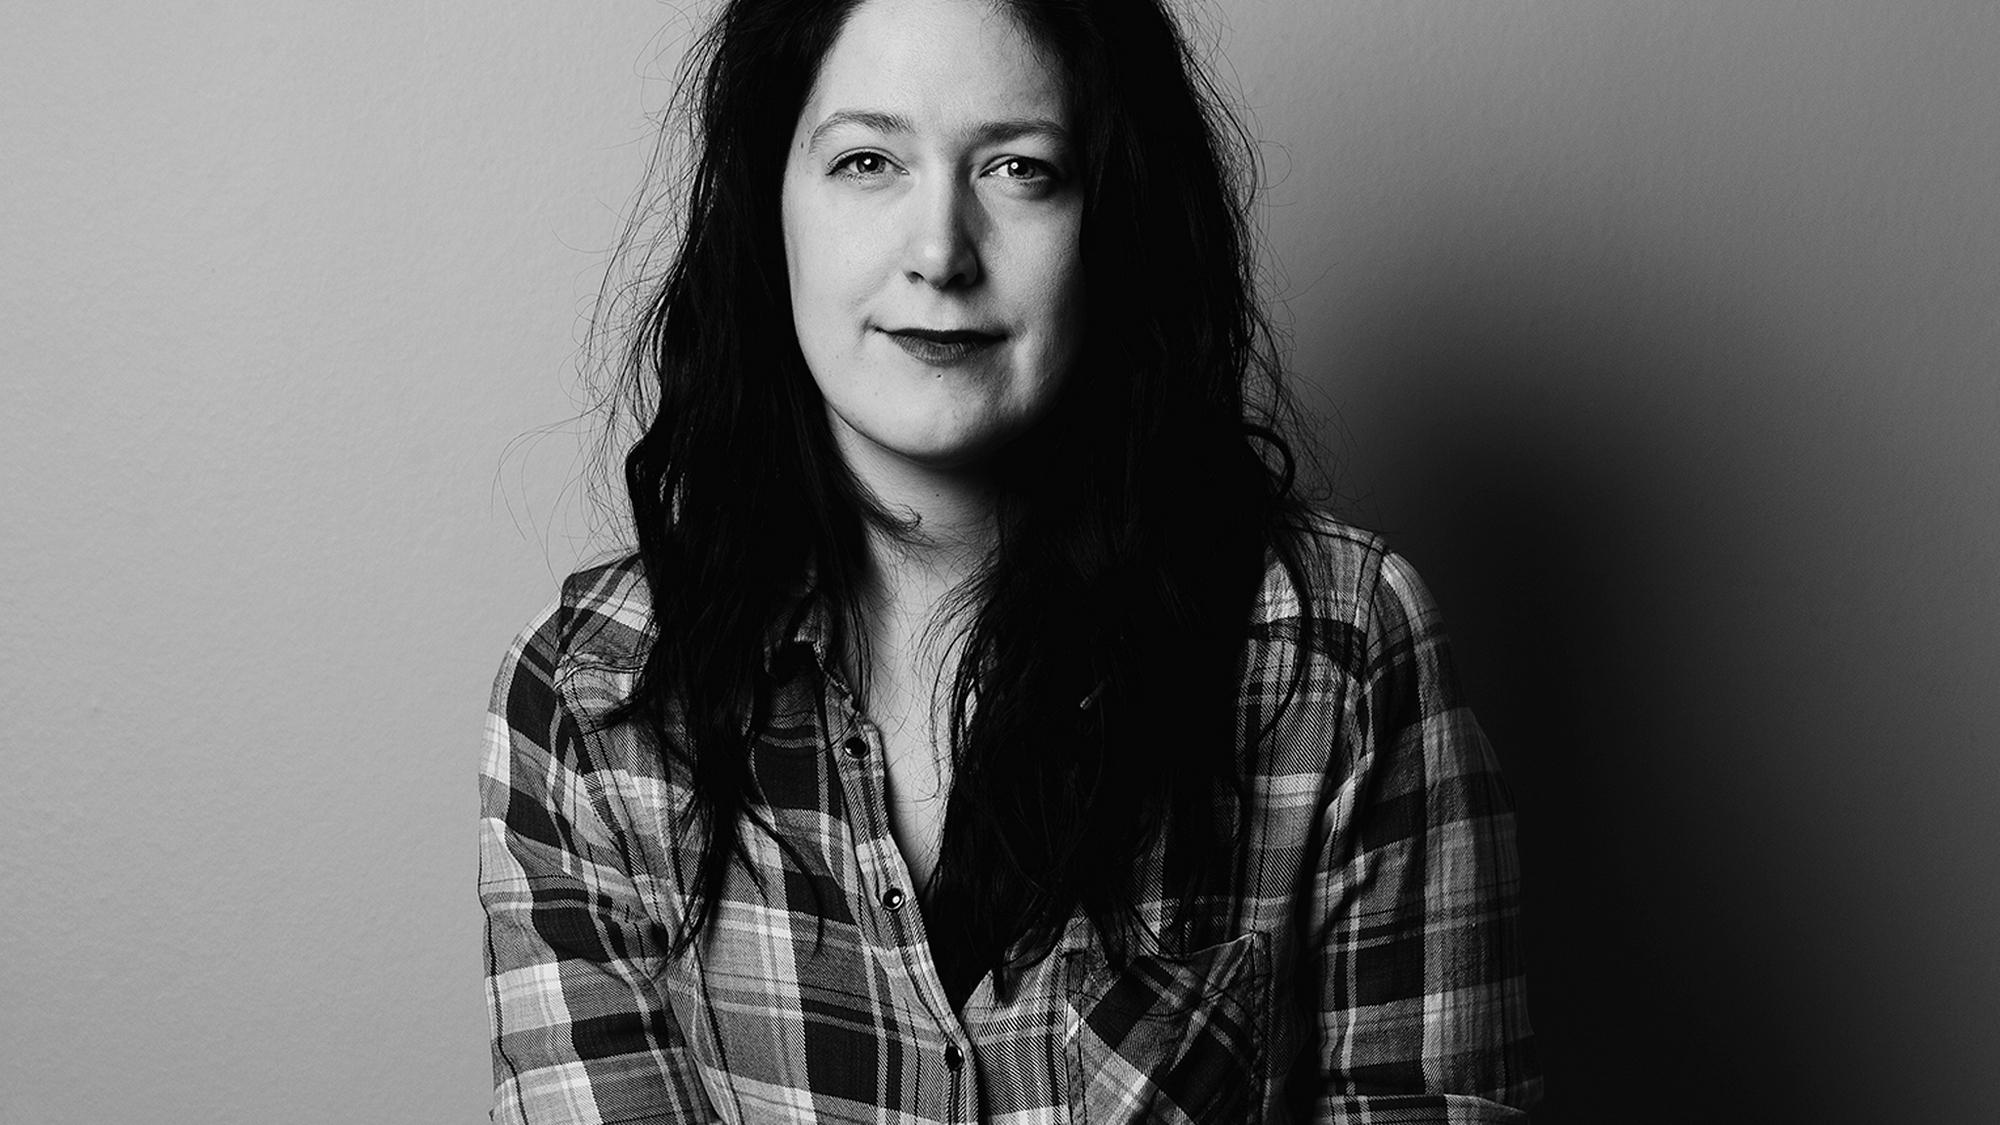 Ida Linde, fot. Magnus Liam Karlsson (źródło: materiały prasowe organizatora)